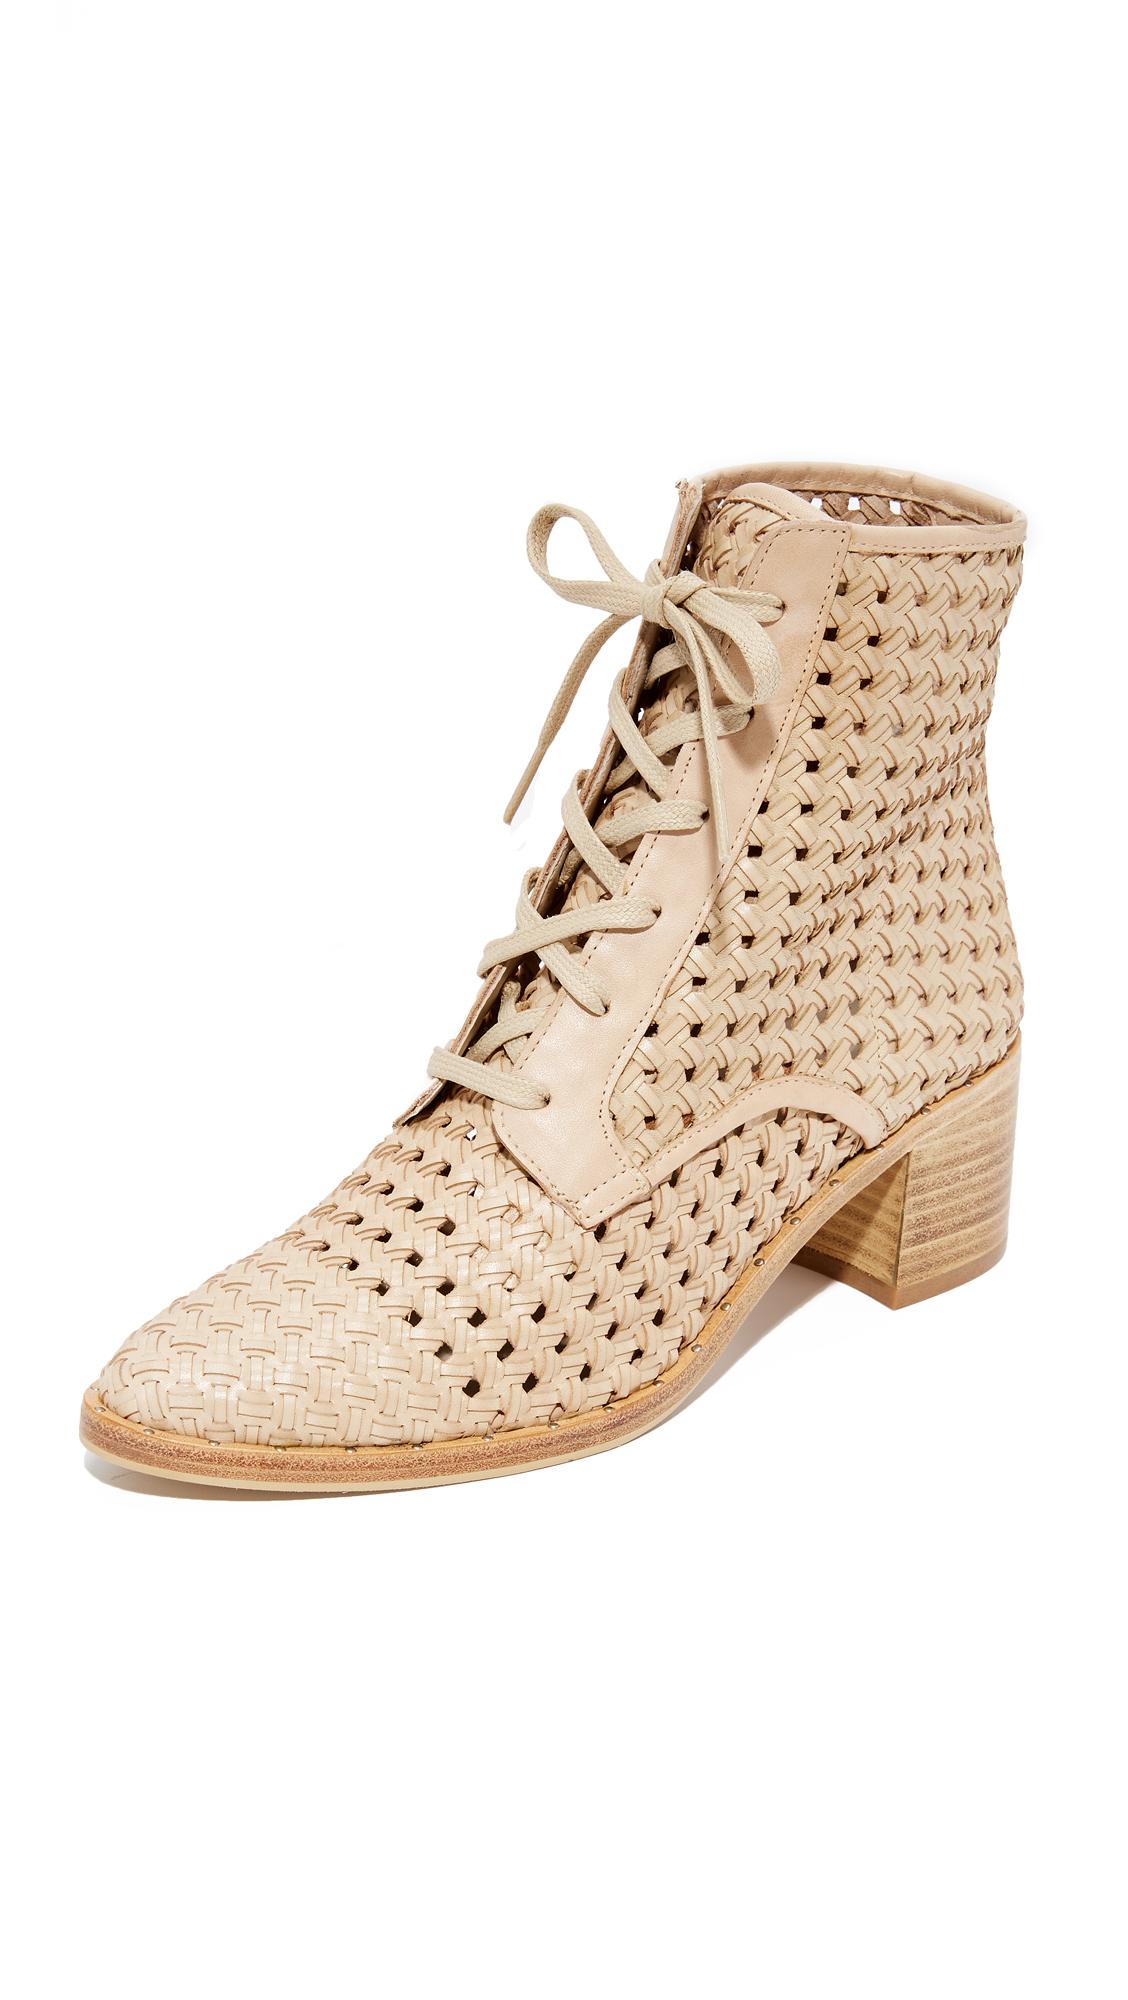 Freda Salvador Ace Woven Boots - Nude